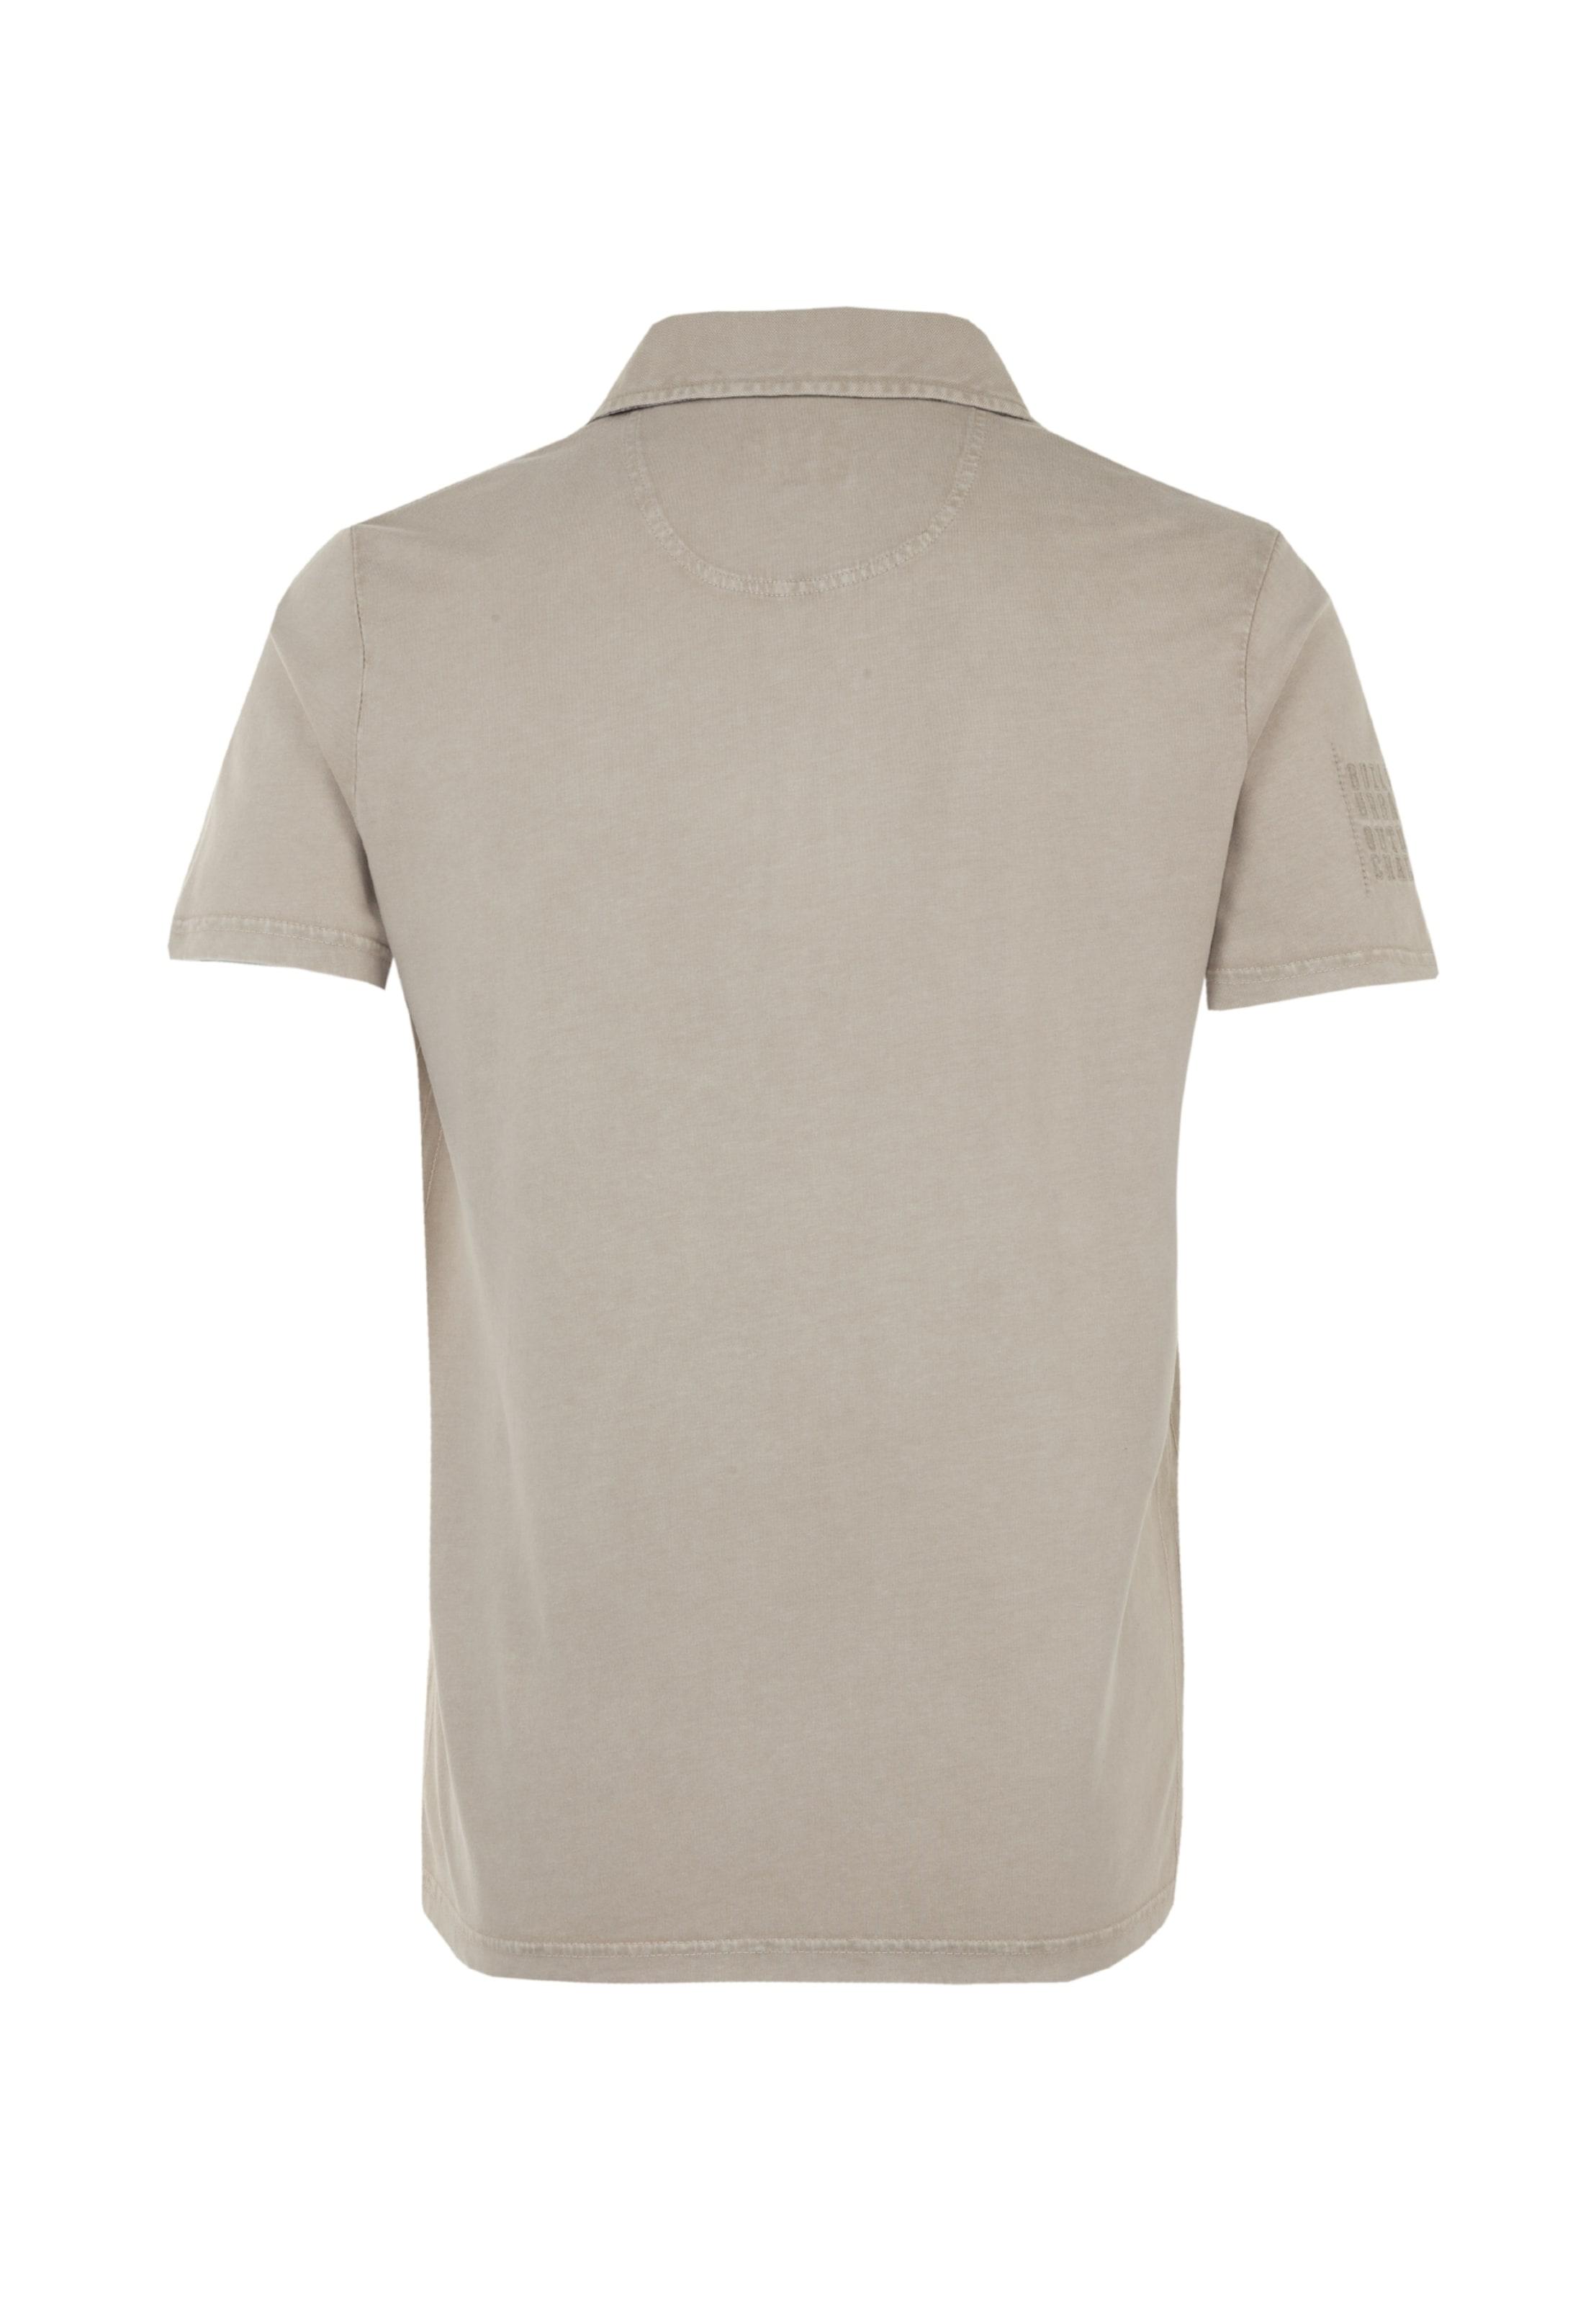 Active Anthracite shirt Camel T En TcK5u1JlF3